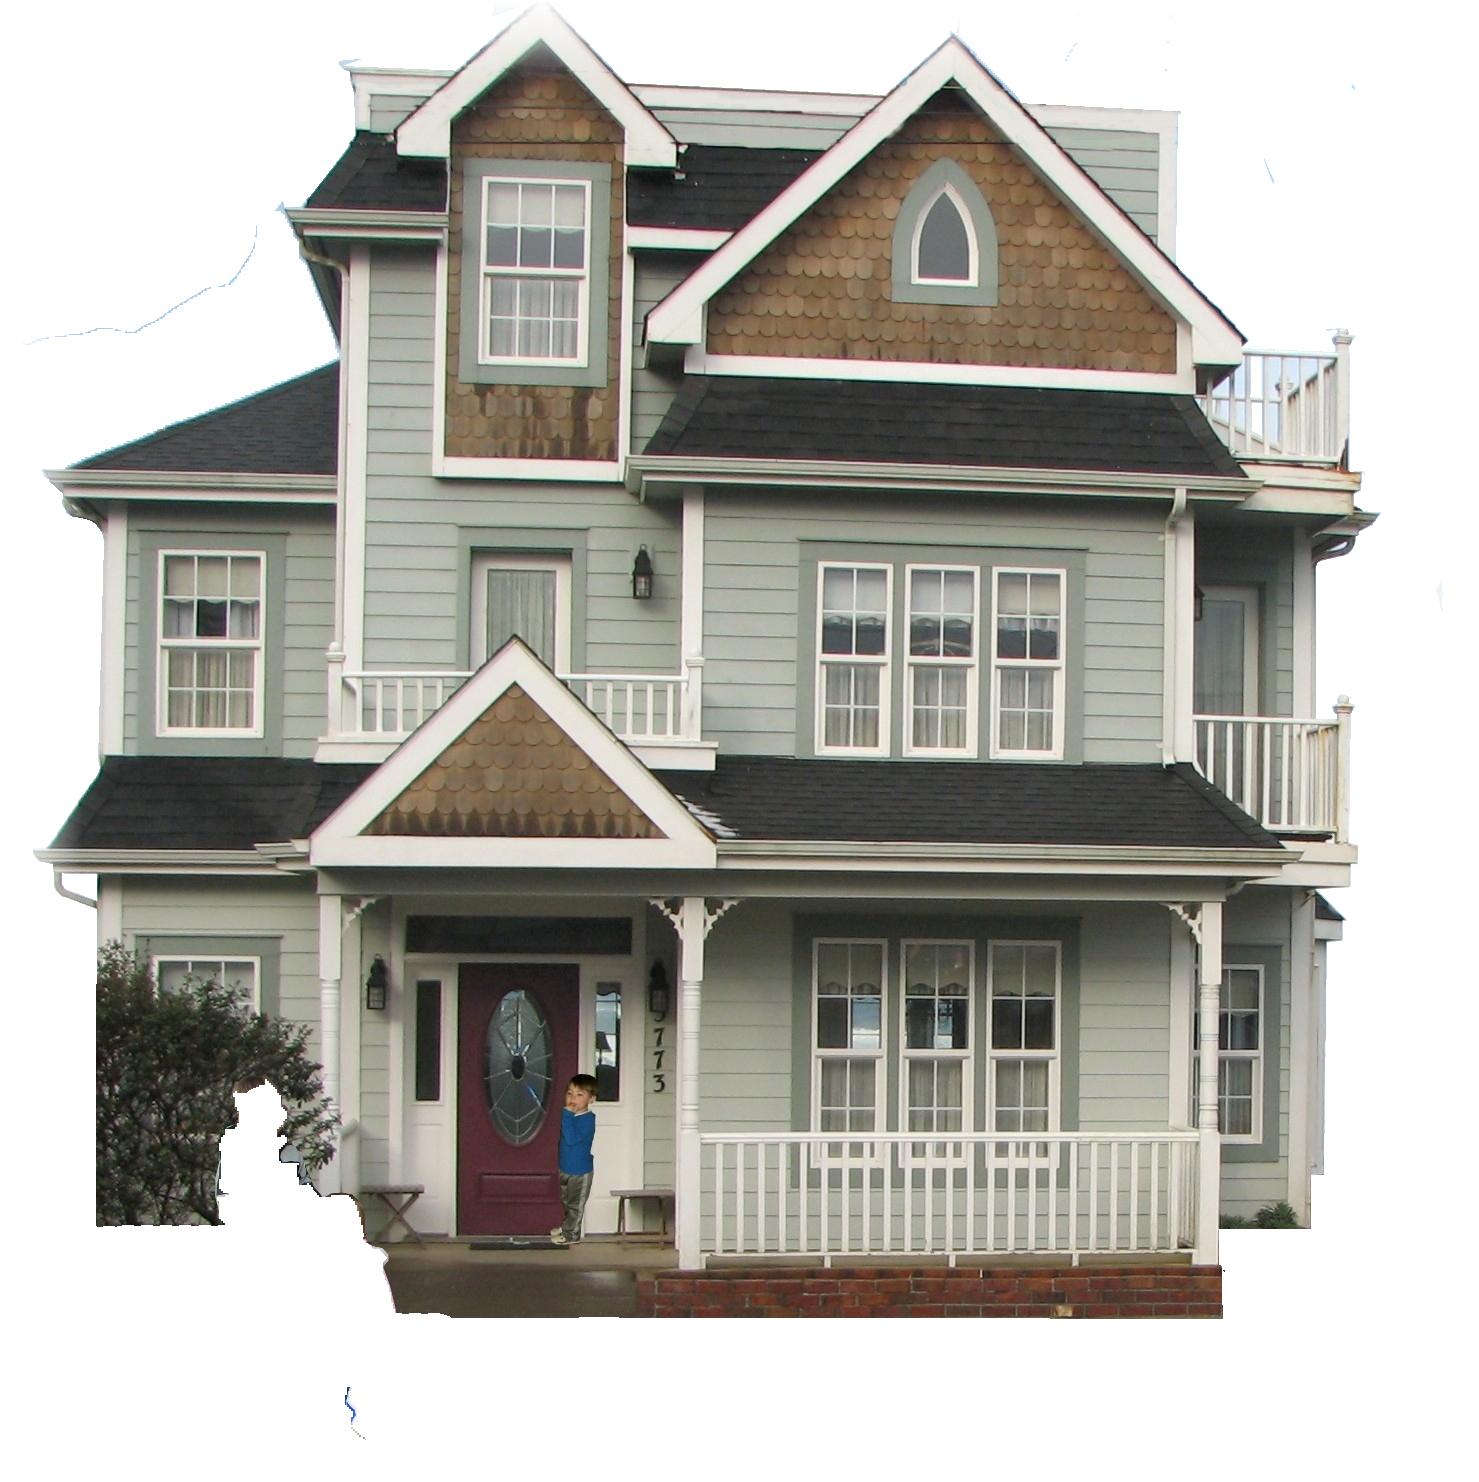 House png transparent. Big image purepng free